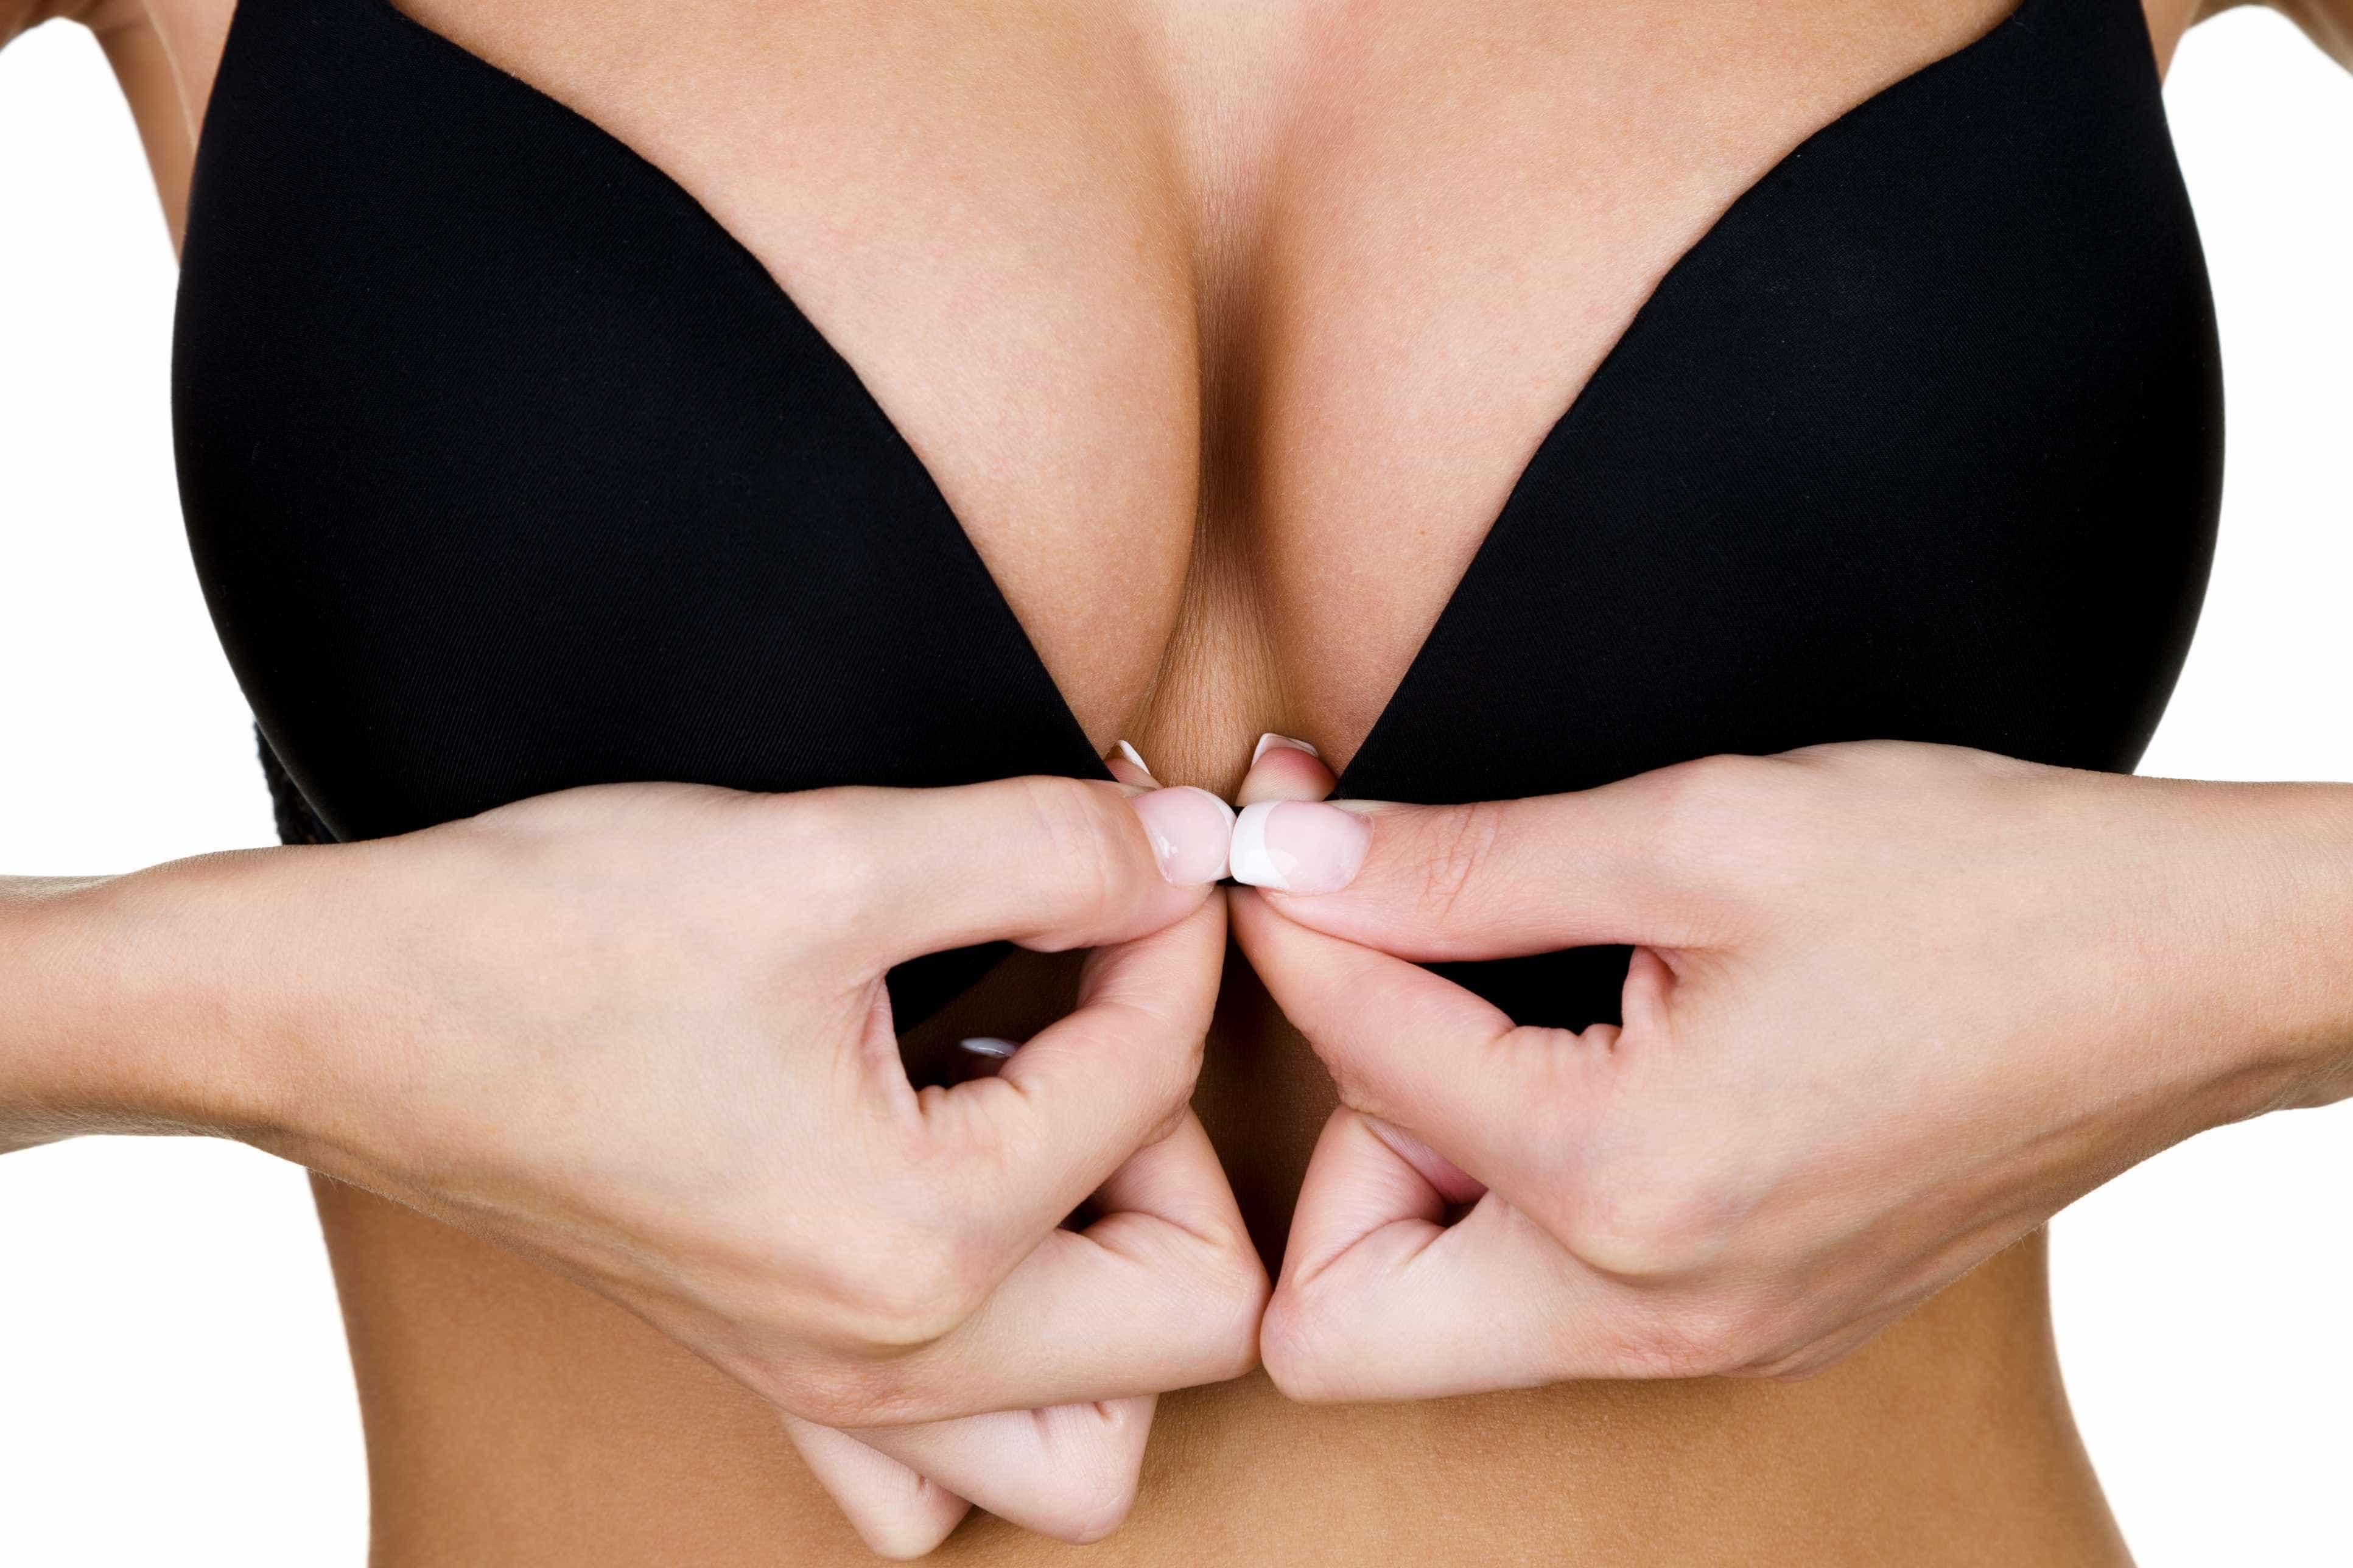 A leitora perguntou: Beber leite de coco aumenta os seios?